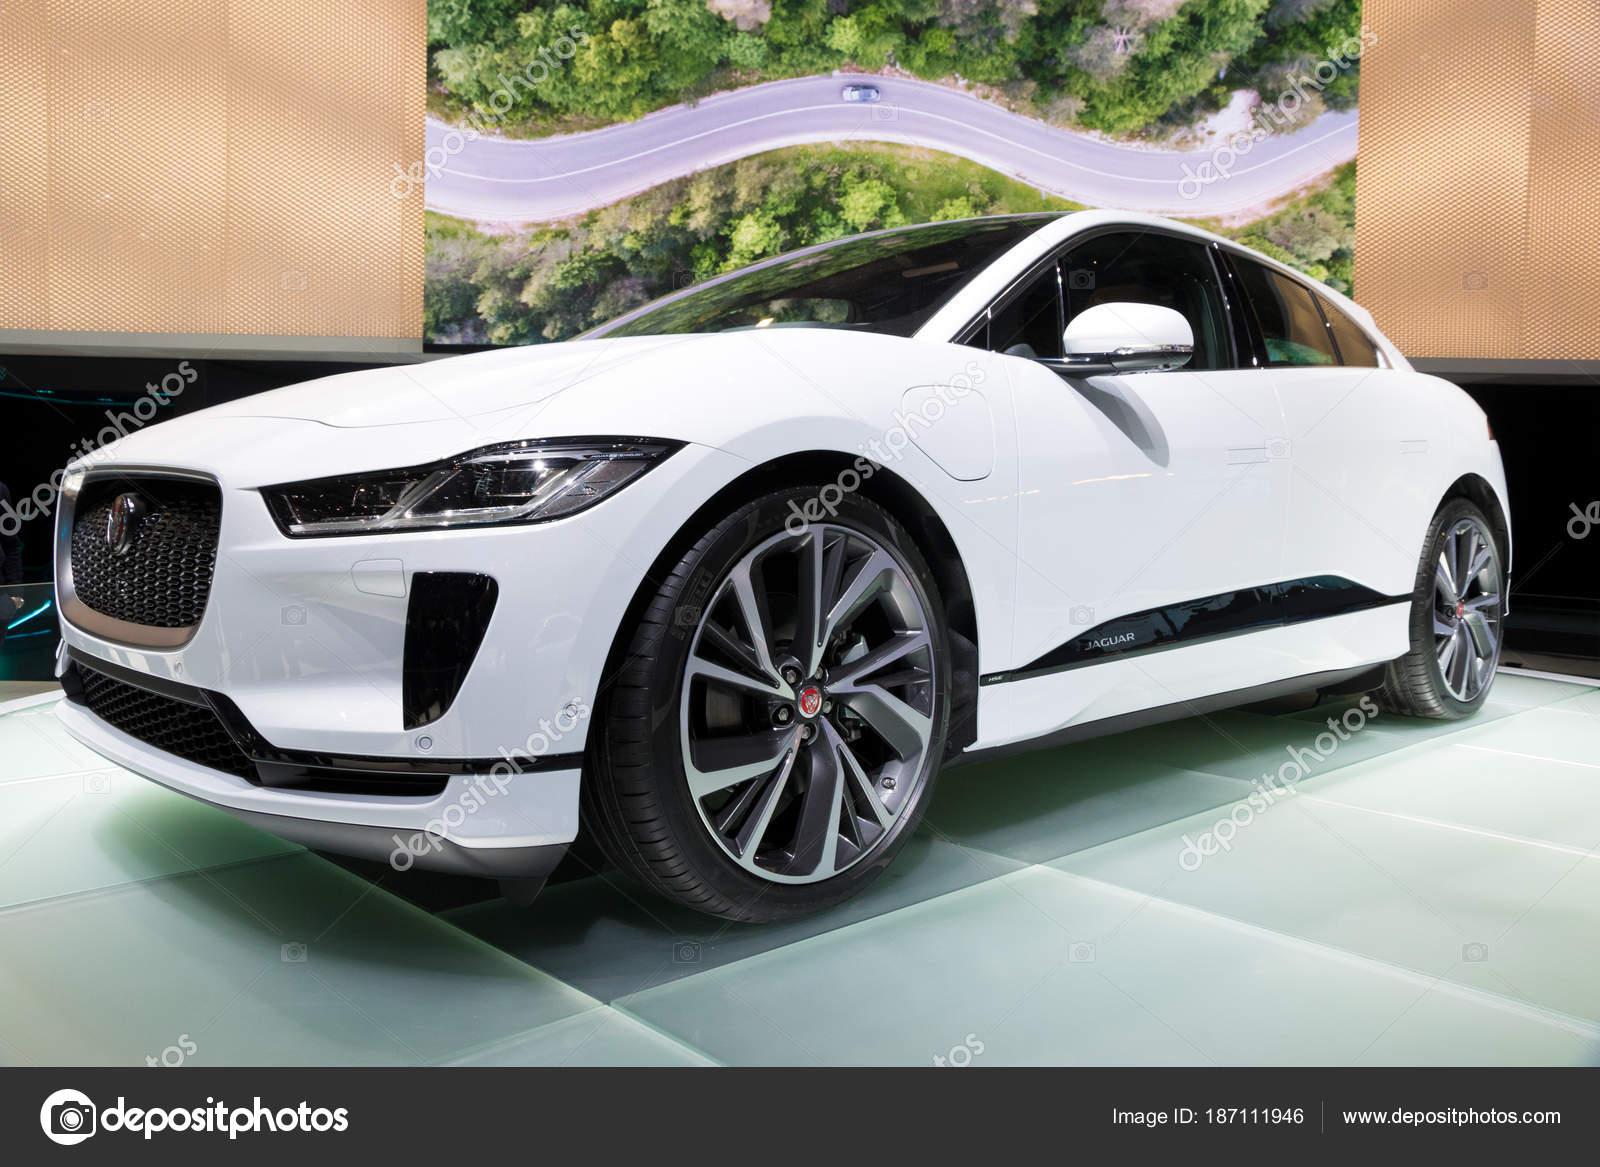 93dde1d25135d Genebra, Suíça - 6 de março de 2018  Jaguar-Pace Suv carro elétrico  apresentado na 88ª Geneva International Motor Show — Foto de Foto-VDW